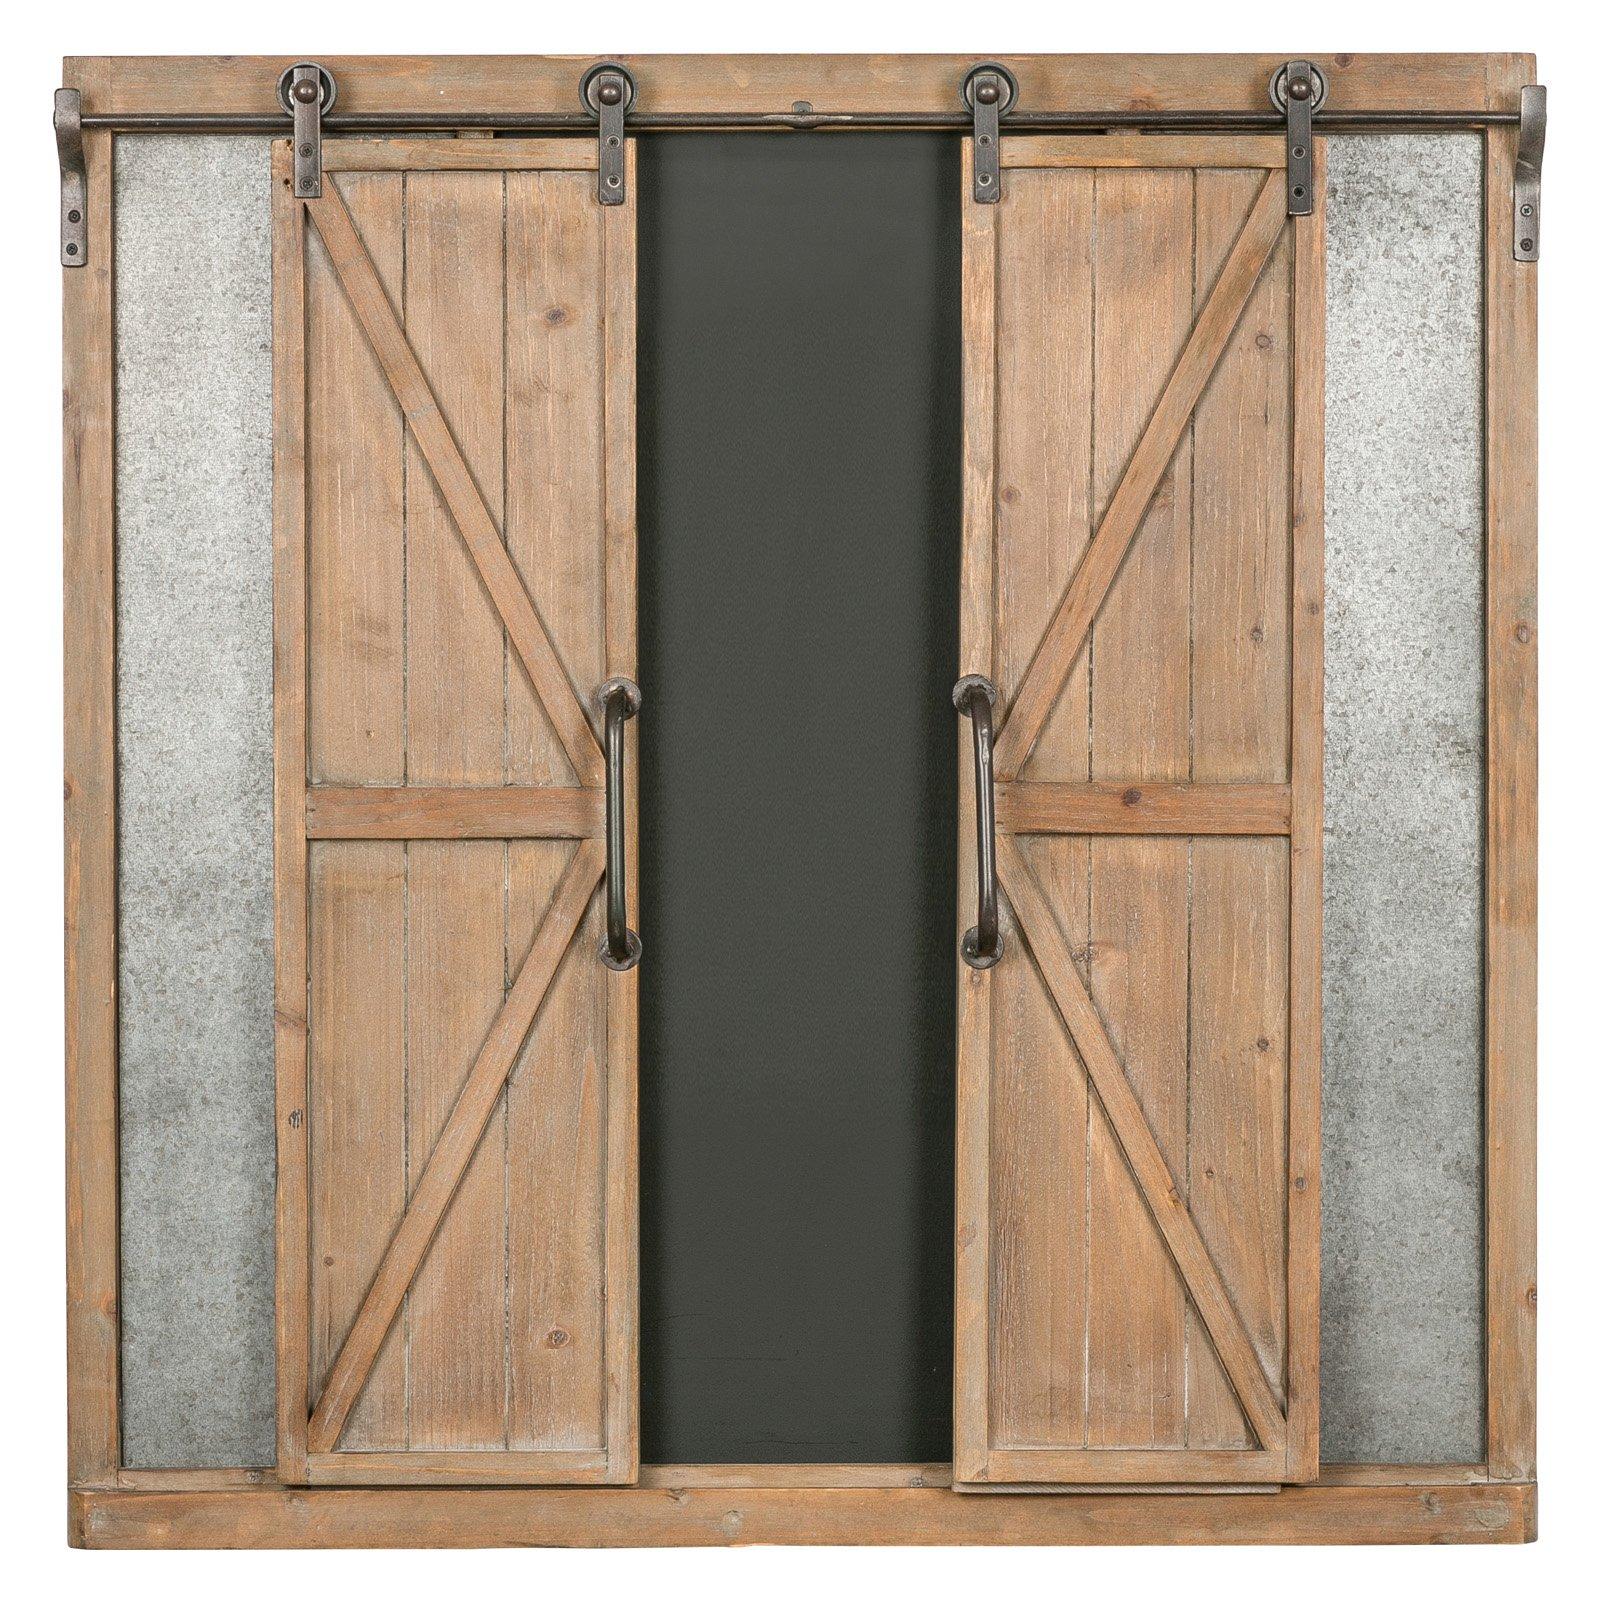 Cooper Classics Devon Chalkboard With Sliding Doors In 2020 Barn